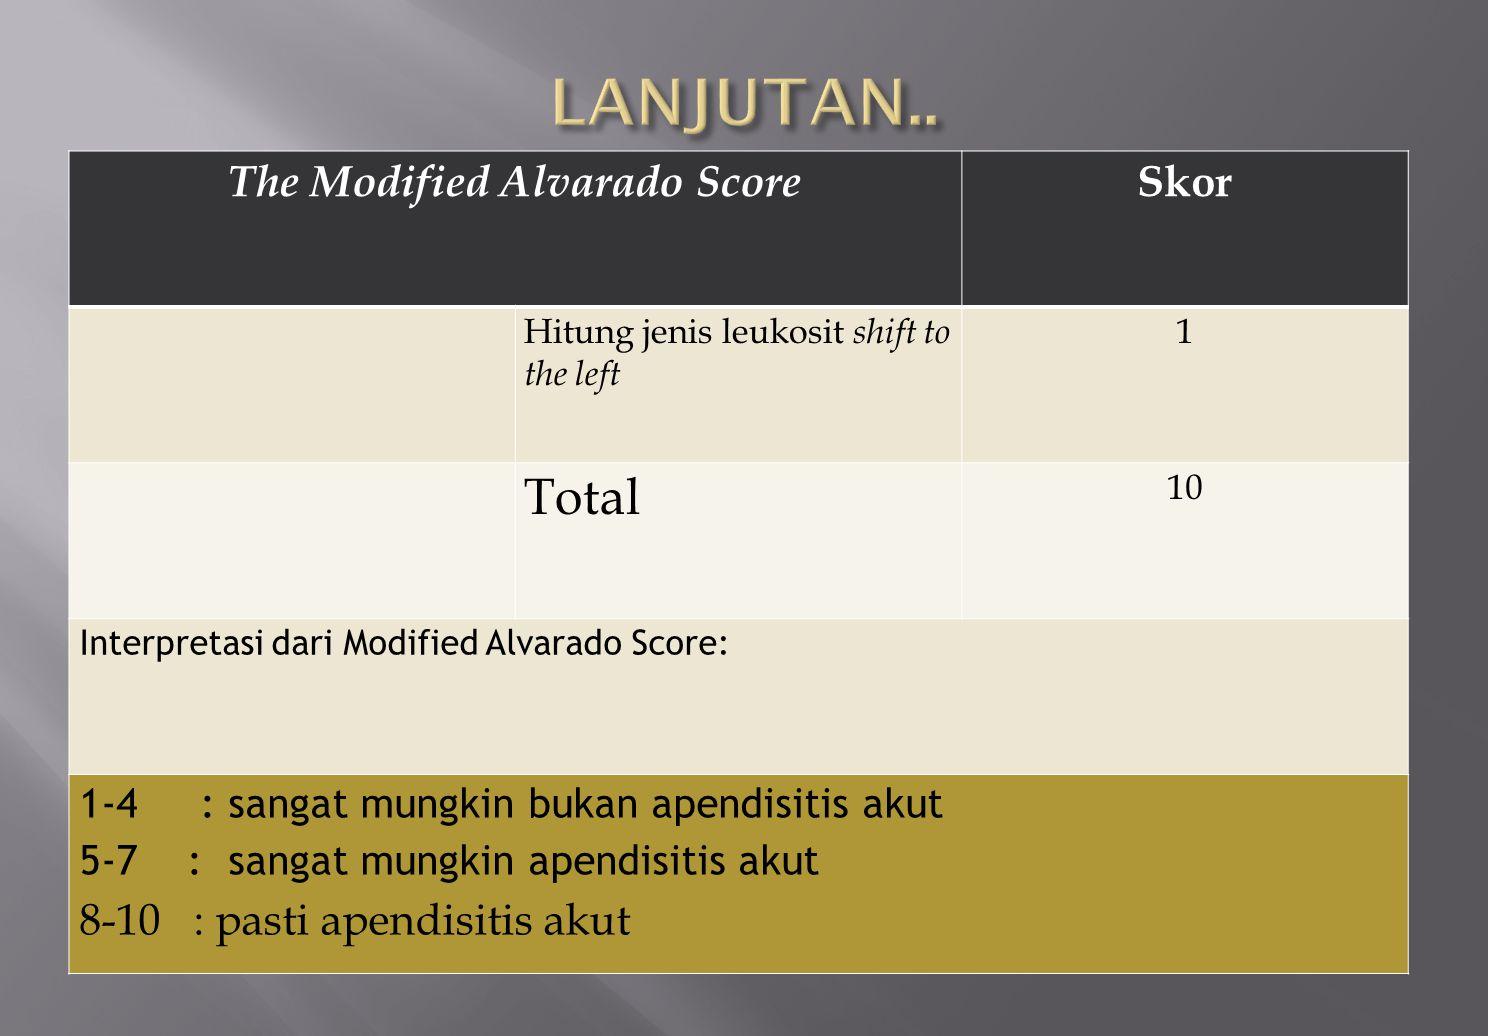 The Modified Alvarado Score Skor Hitung jenis leukosit shift to the left 1 Total 10 Interpretasi dari Modified Alvarado Score: 1-4 : sangat mungkin bu